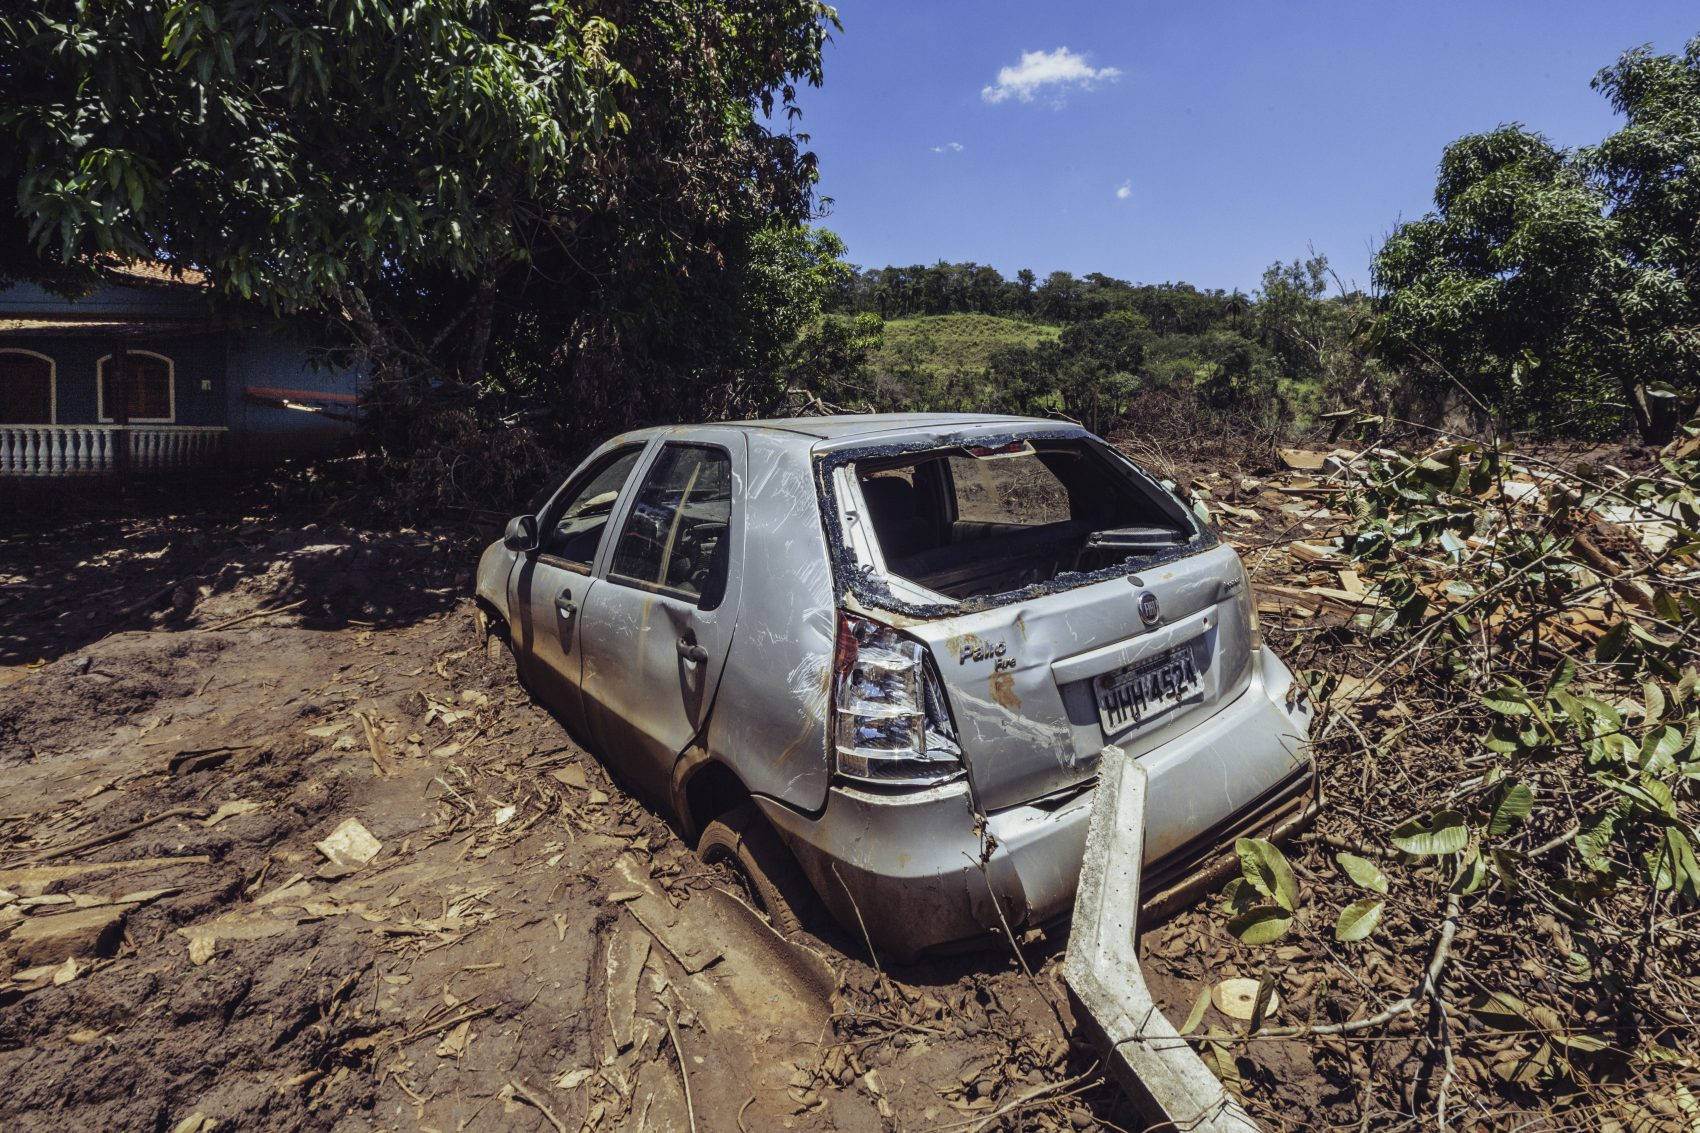 Carro arrastado pela lama tóxica (Foto: Andre Mantelli)